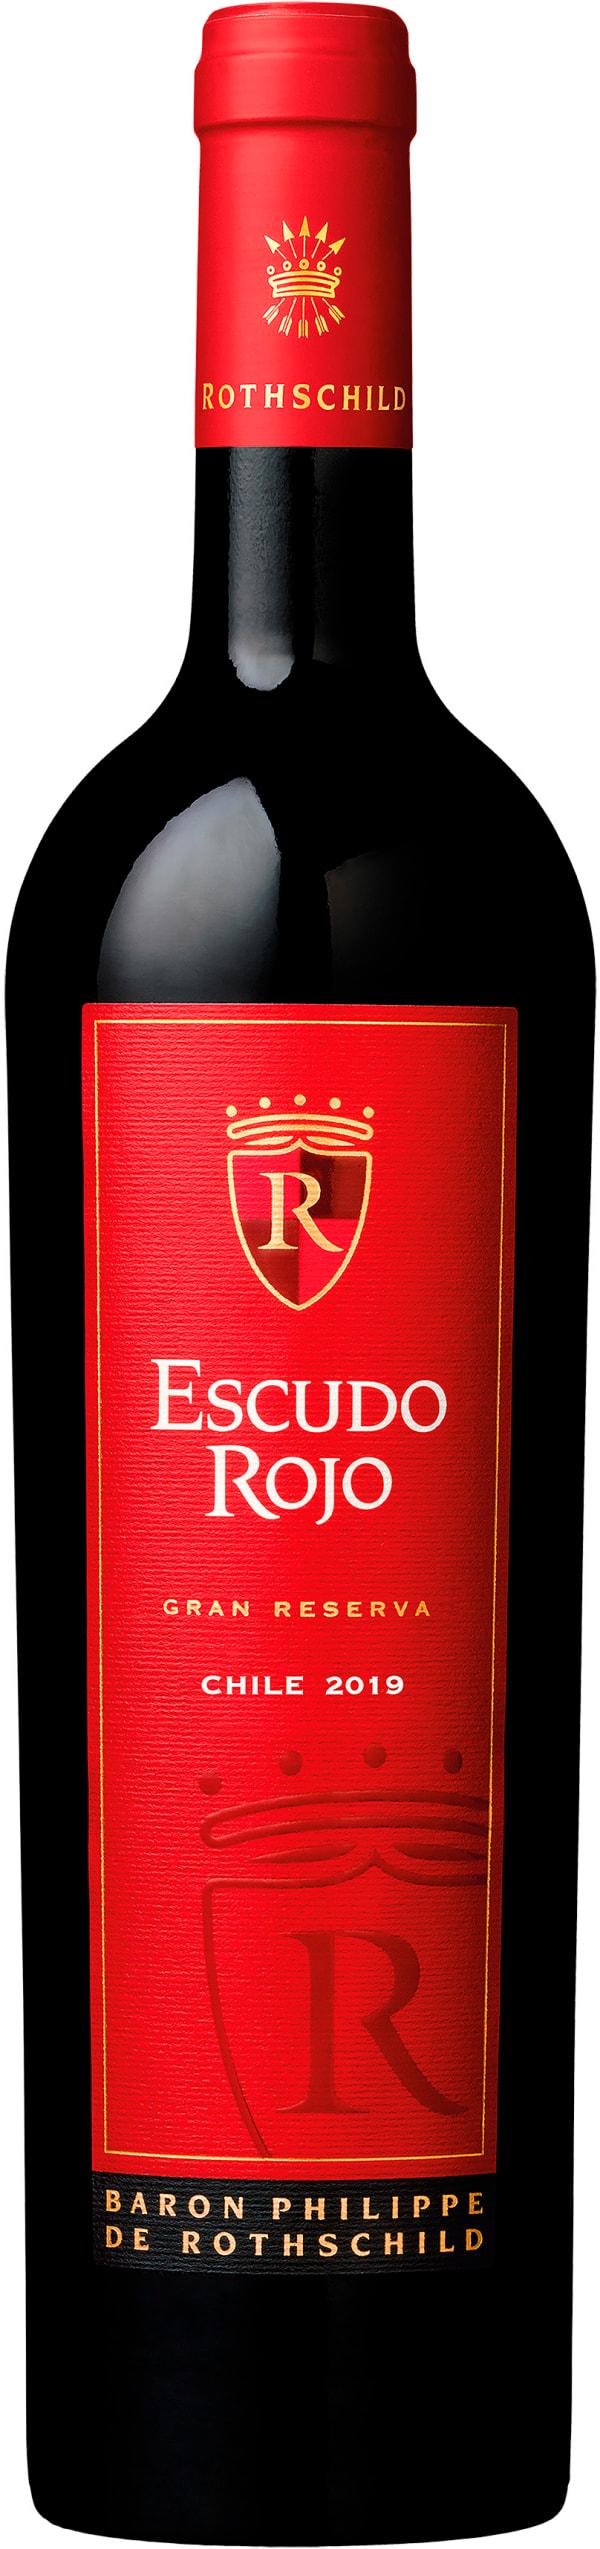 Escudo Rojo 2015